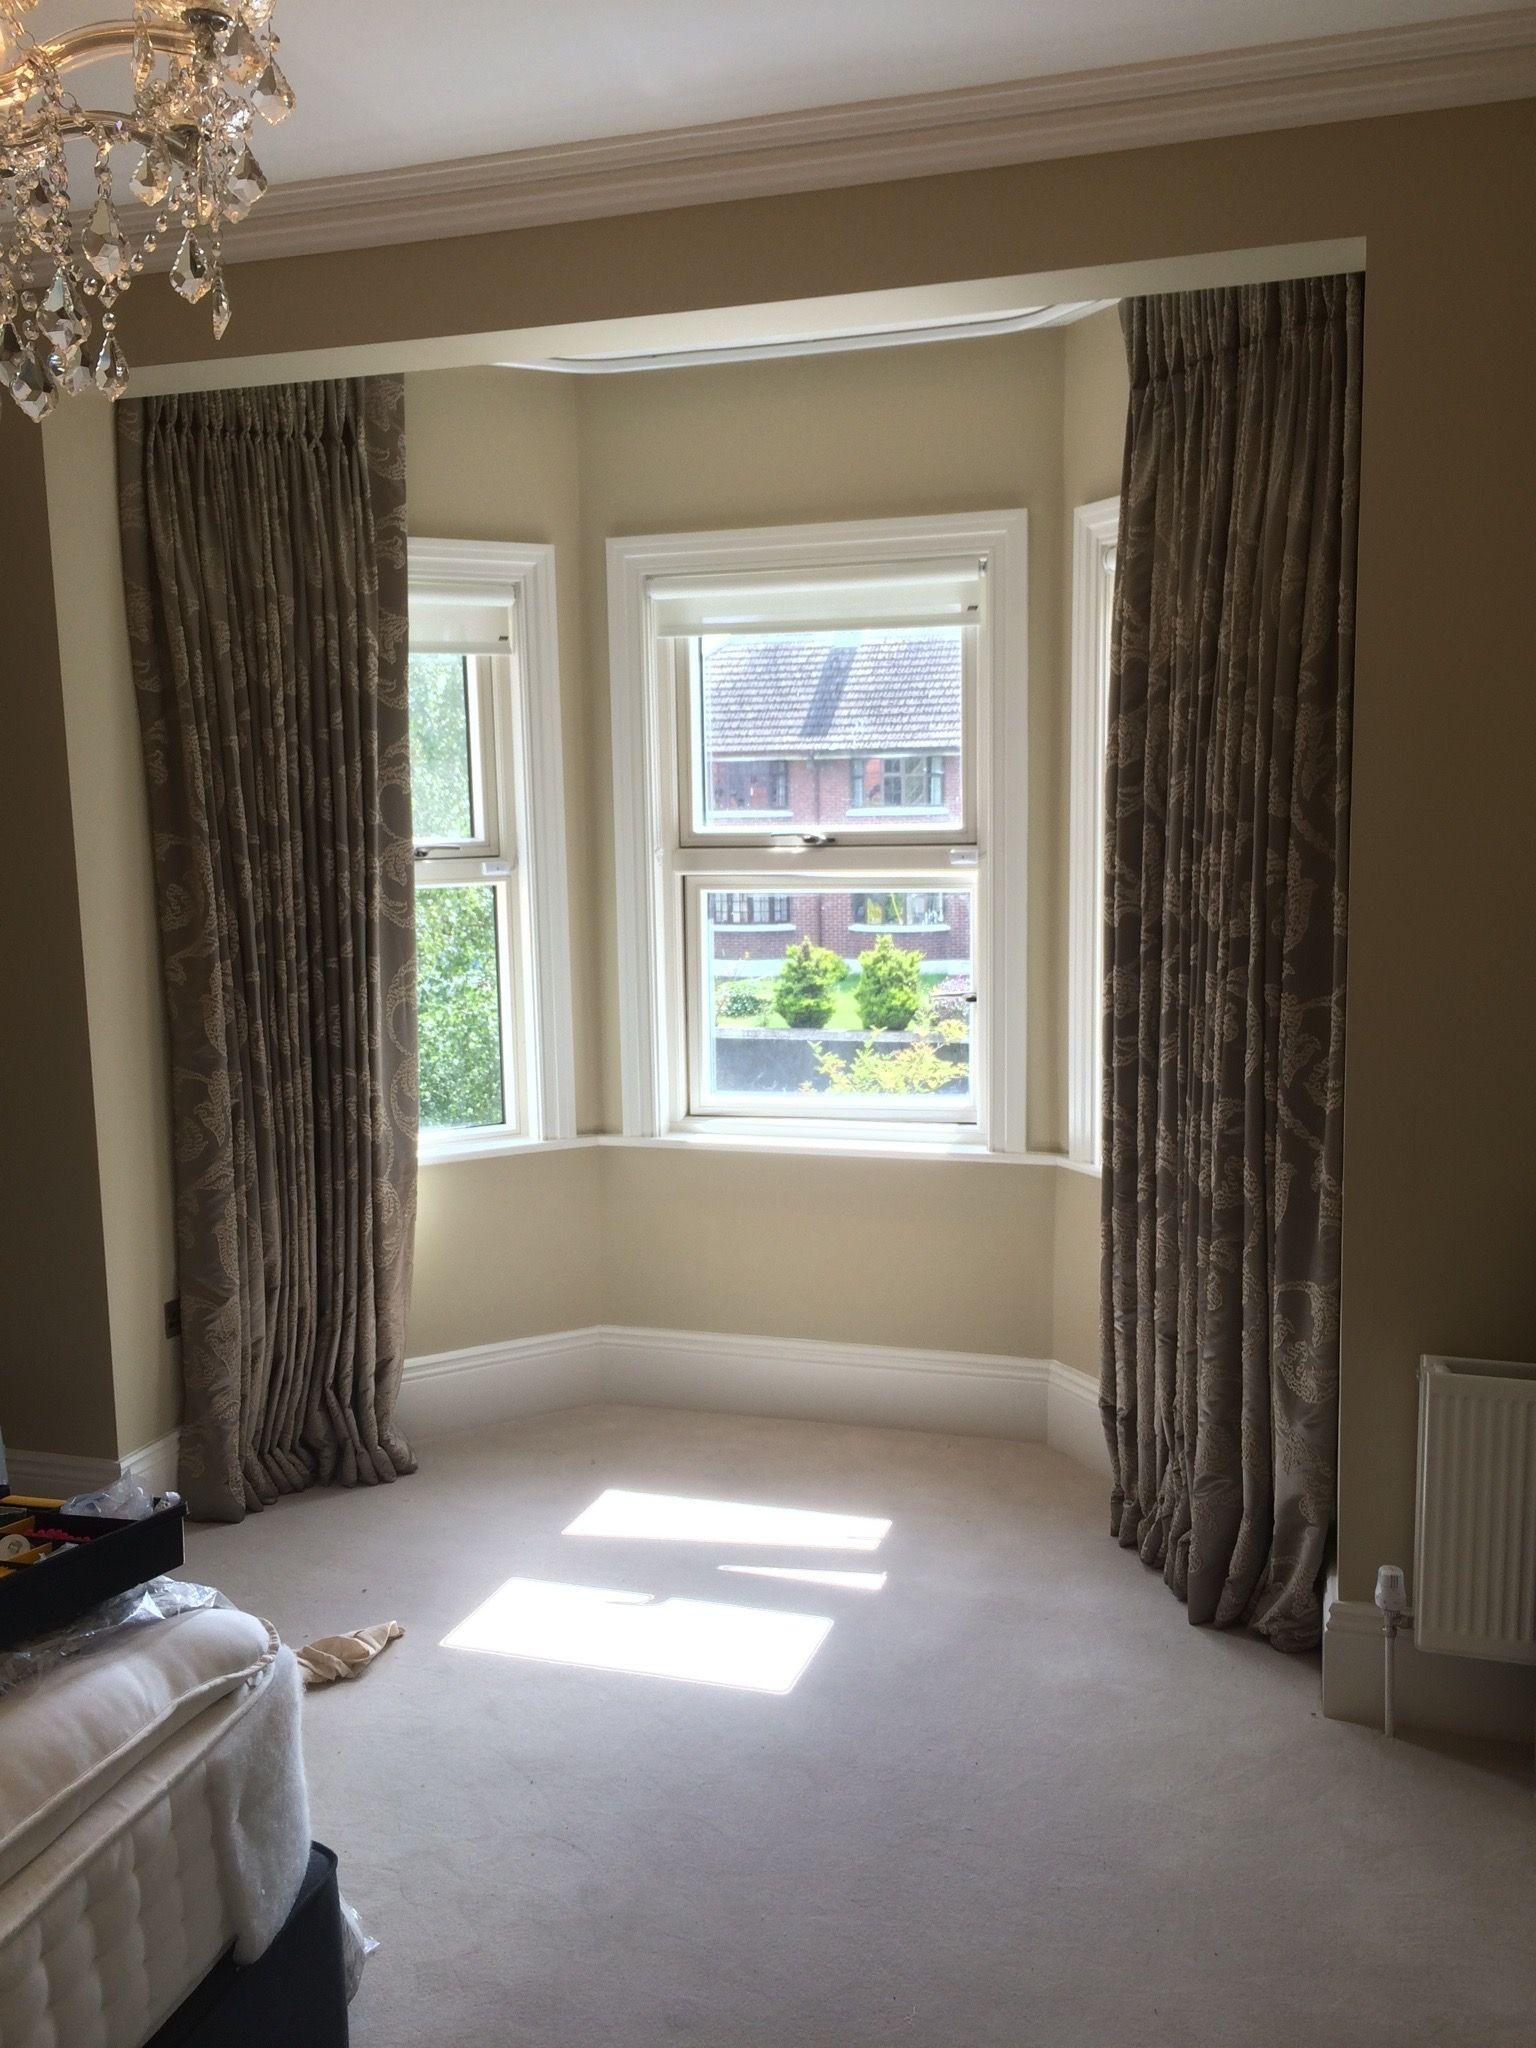 Bedroom bay window curtain Bay window curtains, Bay